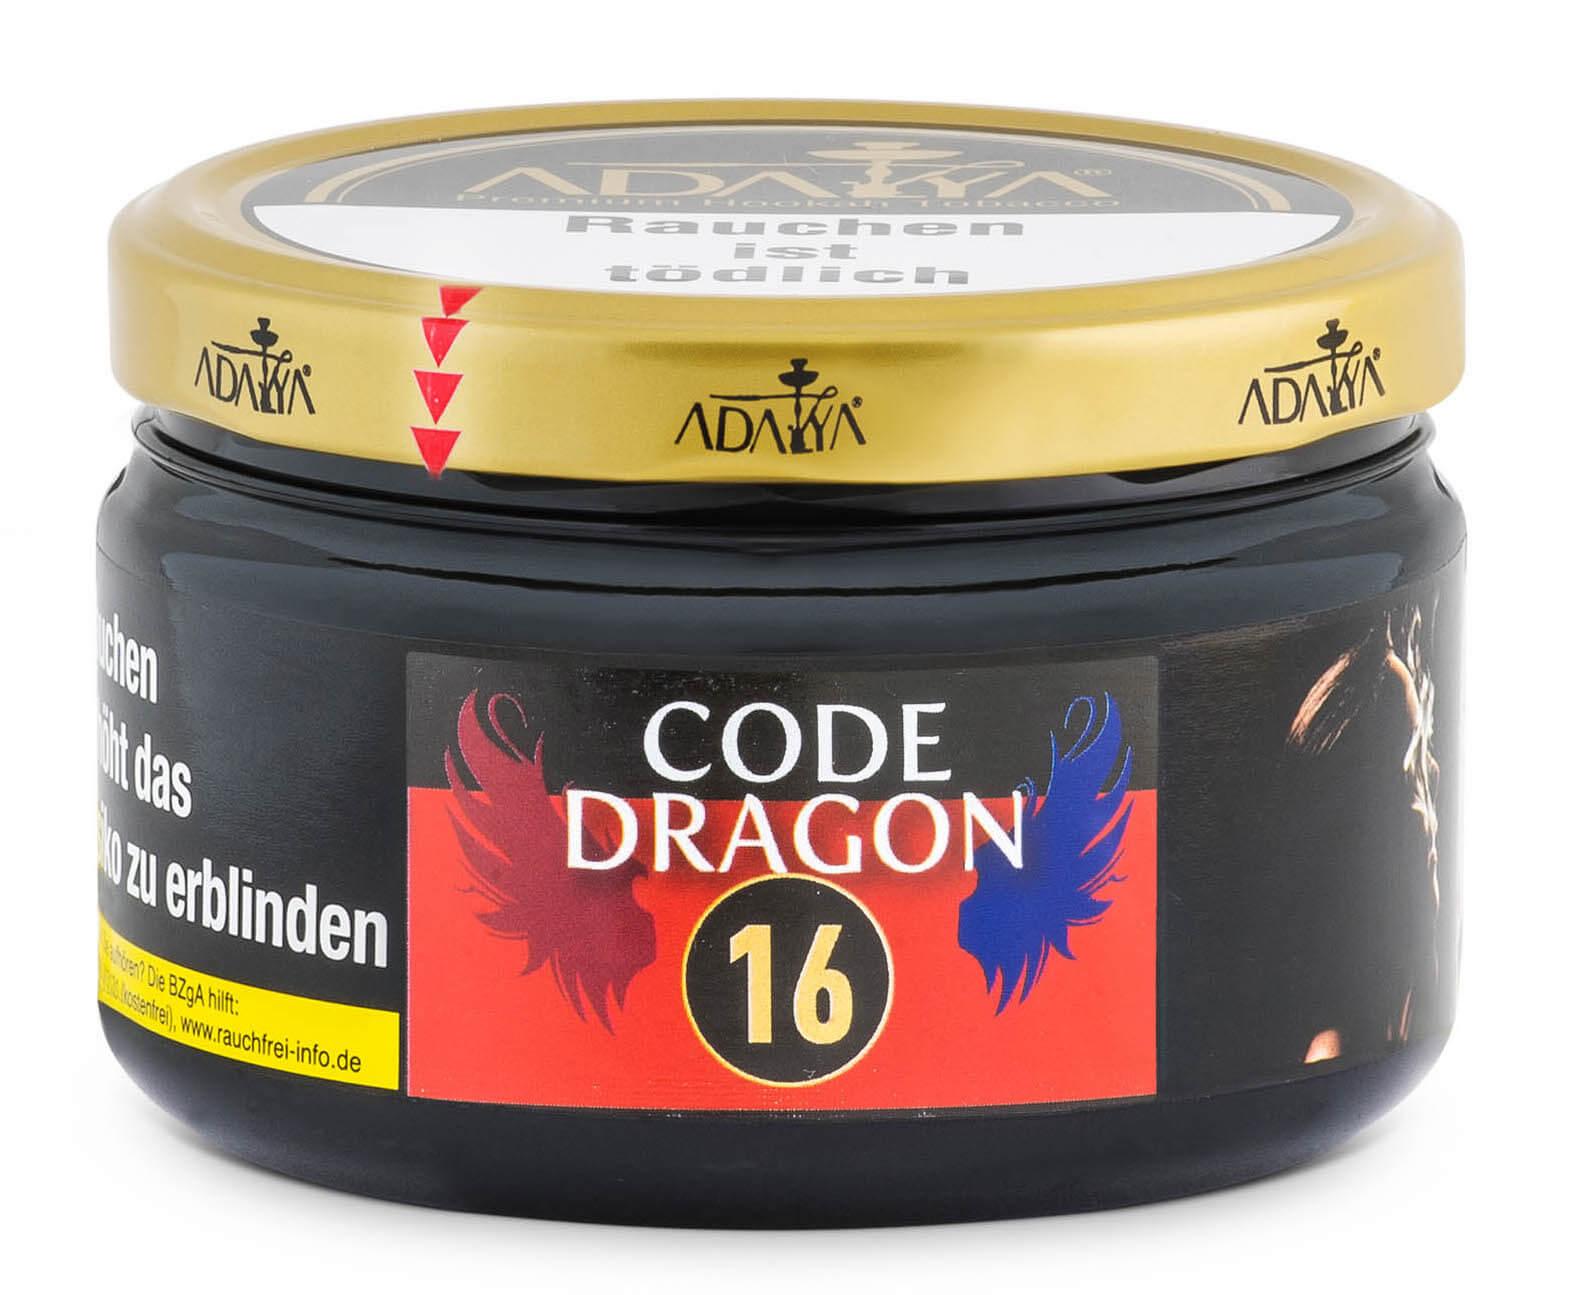 Adalya Tabak Code Dragon #16 200g